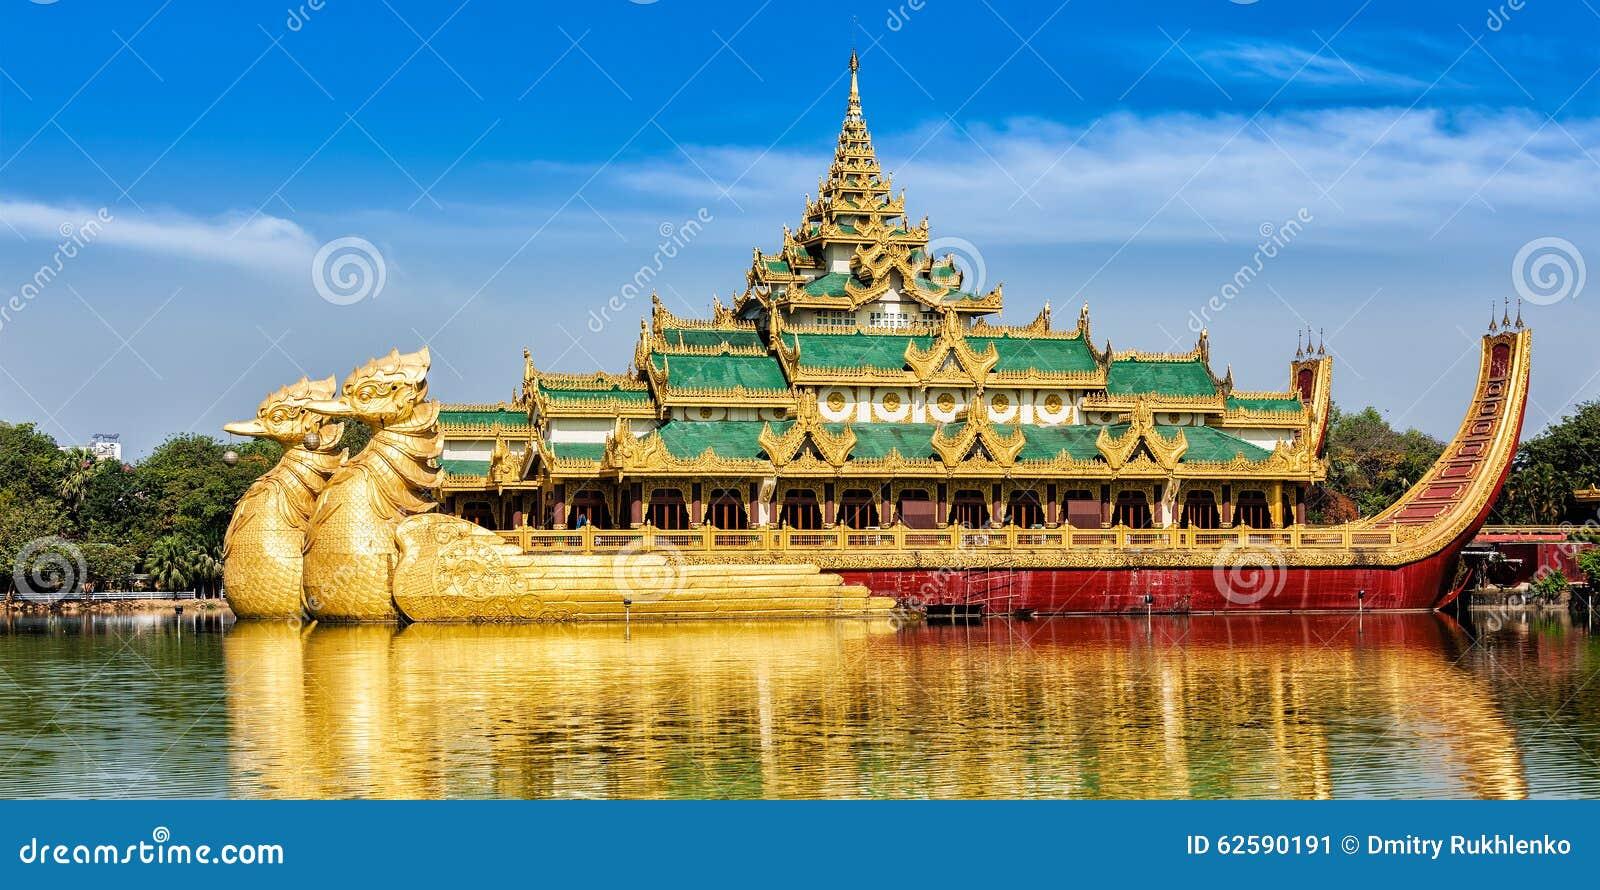 Баржа Karaweik королевская, озеро Kandawgyi, Янгон